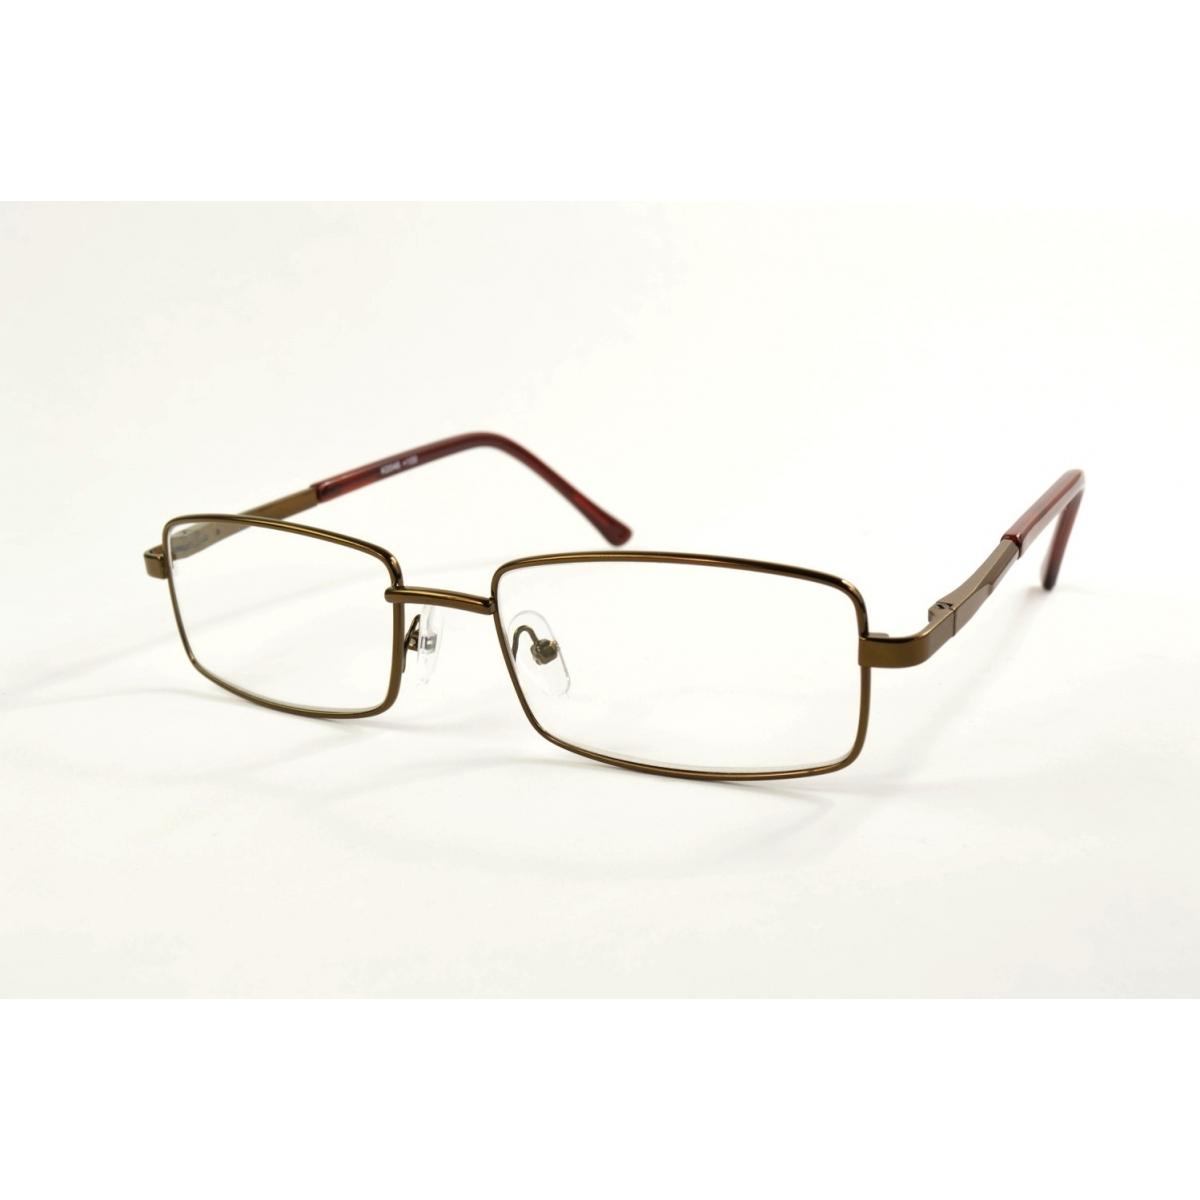 Wide rectangular metal reading glasses